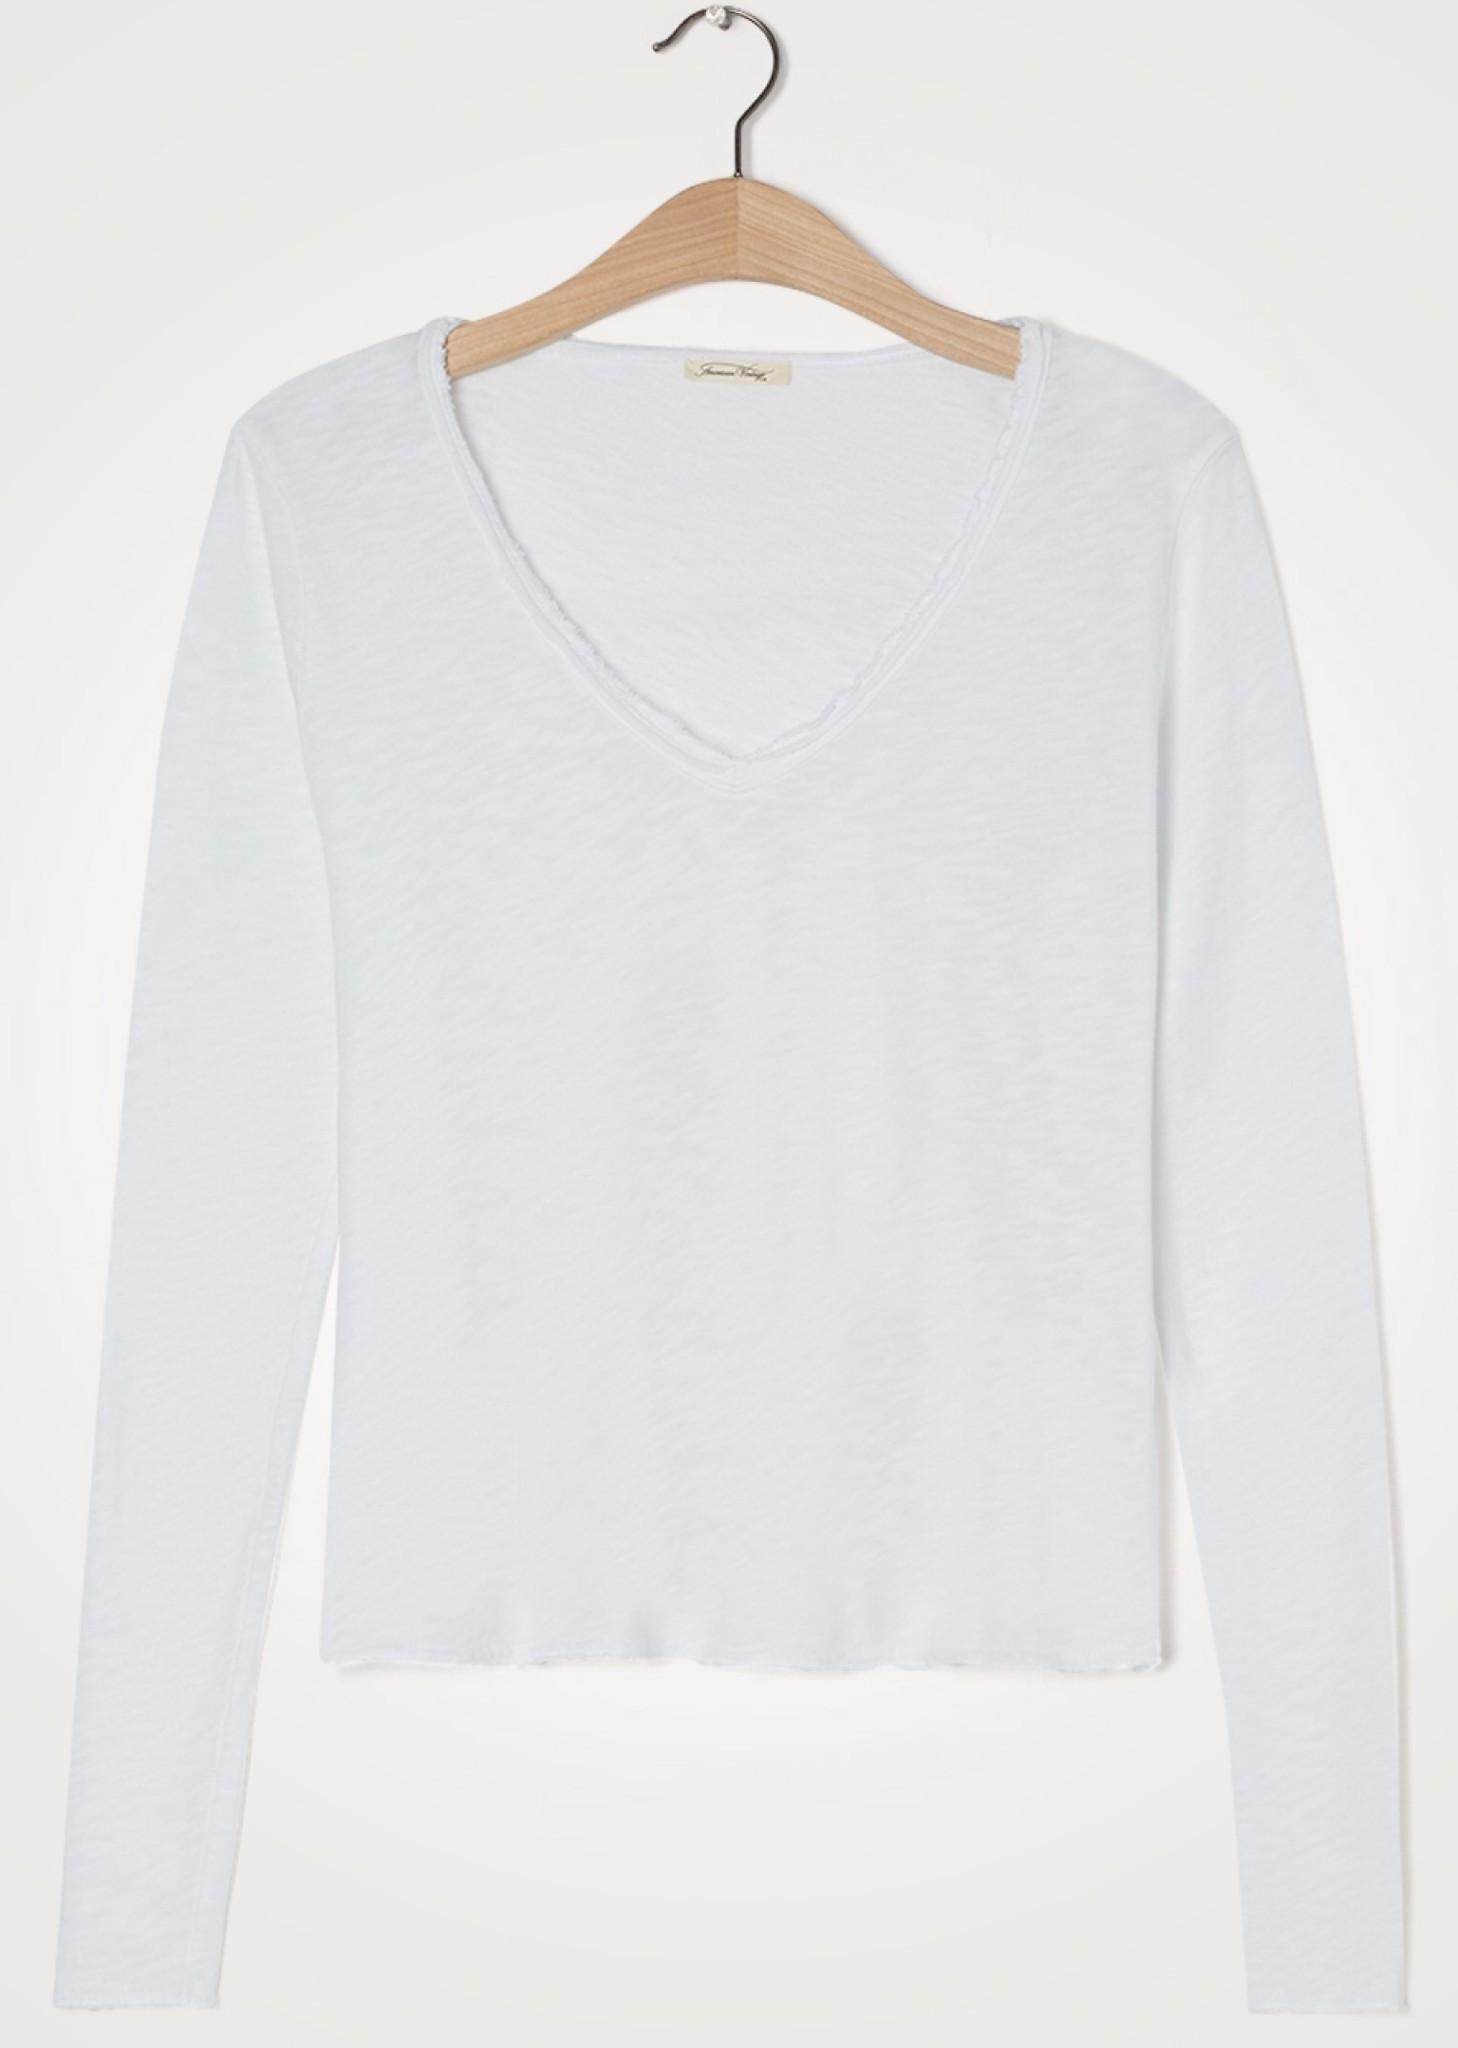 T-shirt Sonoma blanc-2